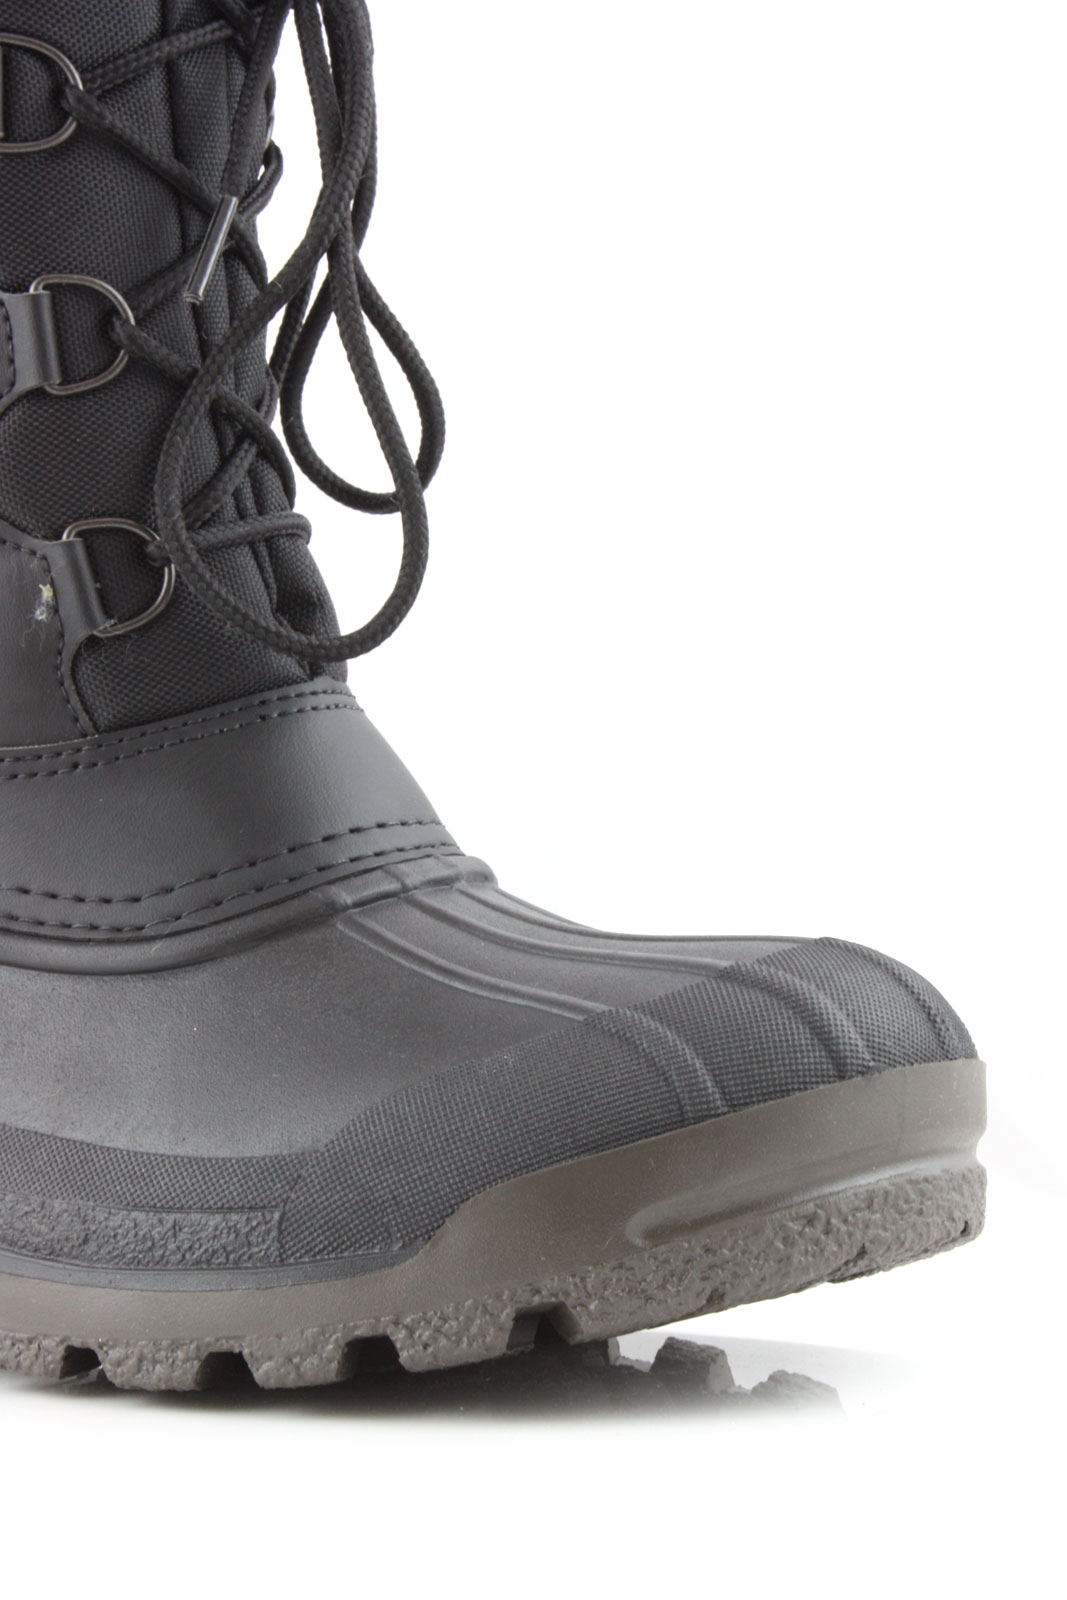 Canadian Shop Gratis Olang Verzending Nero Snowboots nl Fzd41qw4